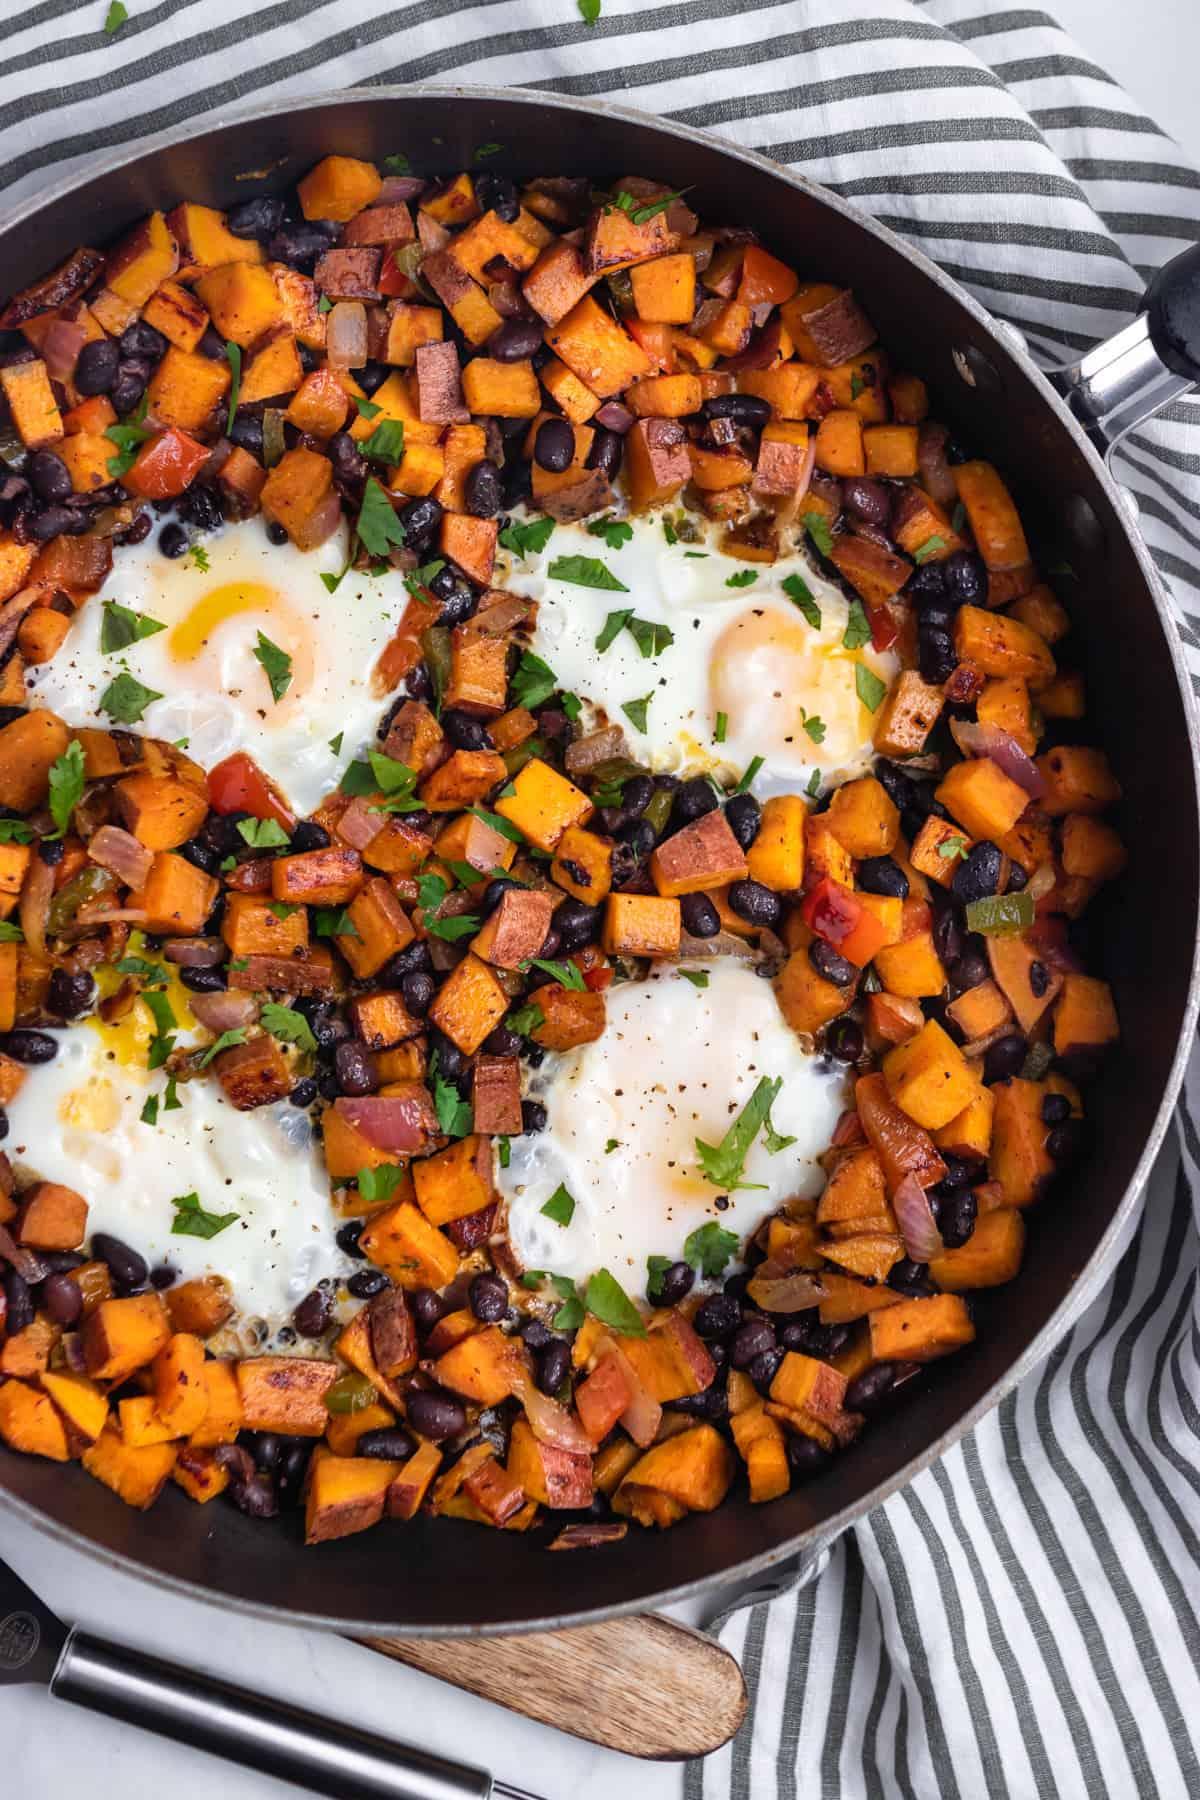 Frying pan with sweet potato hash and eggs.